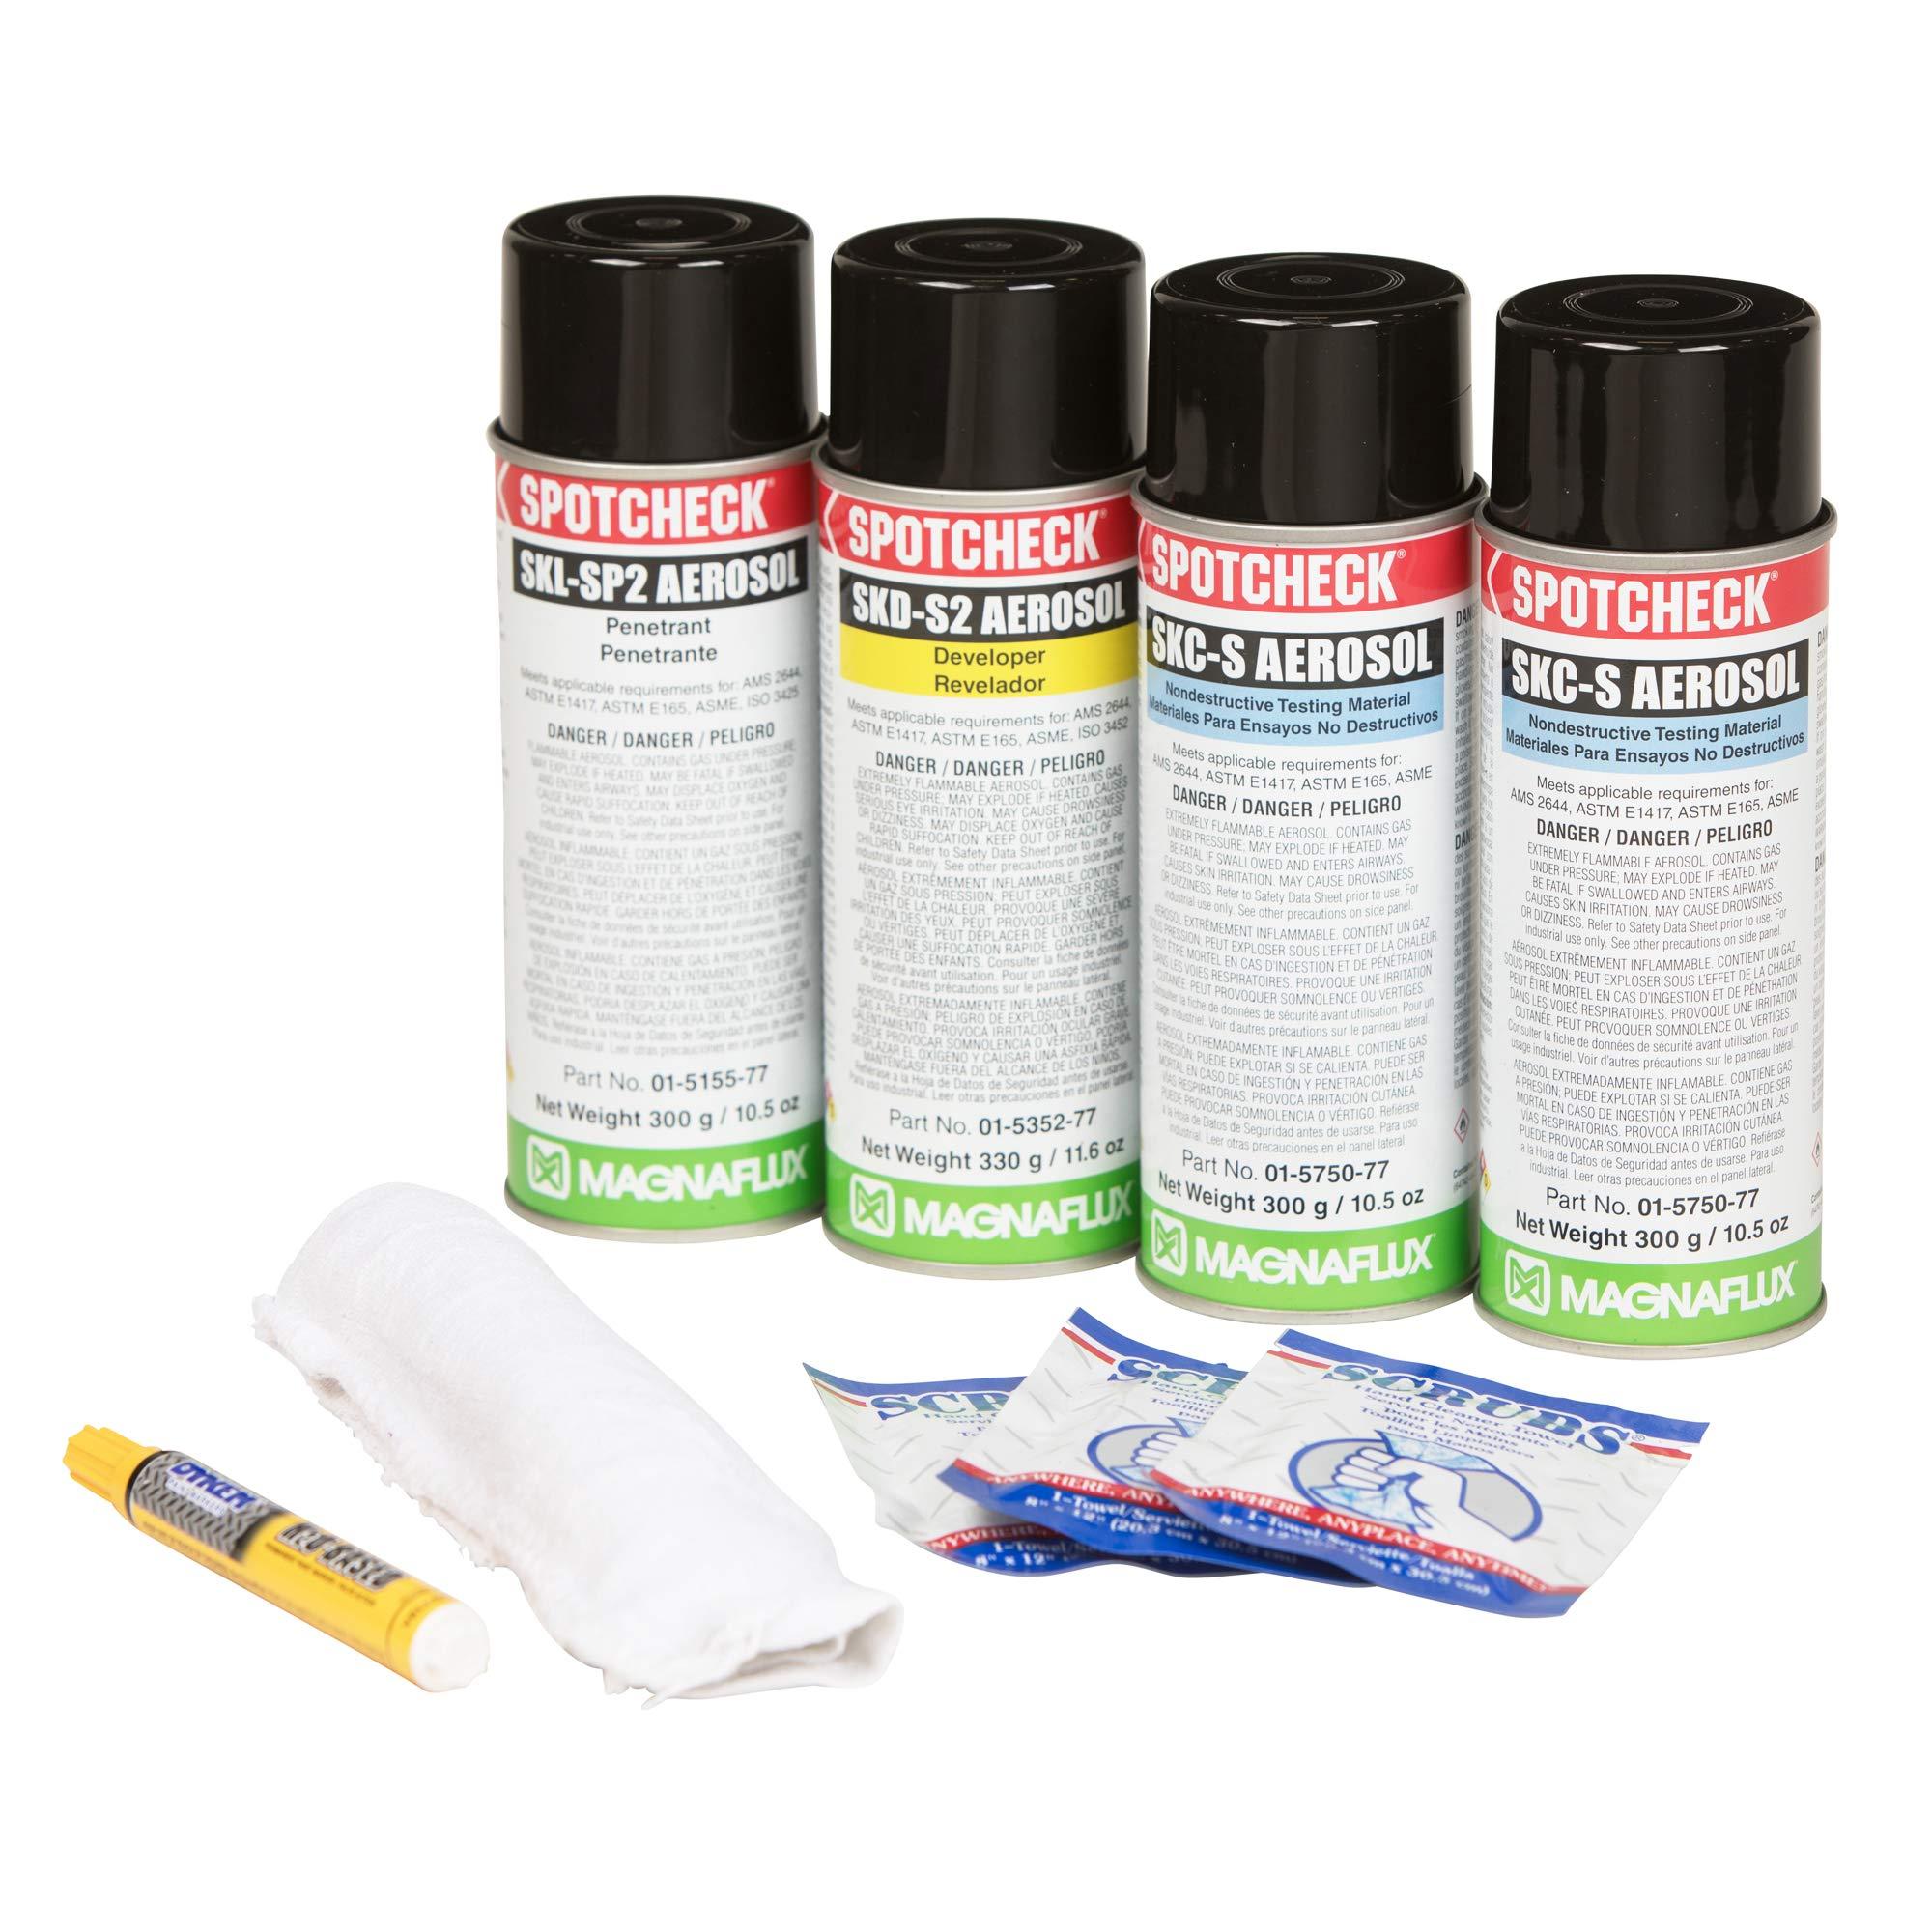 Magnaflux Spotcheck Penetrant Inspection Kit, SK-416 (387-01-5970-48)